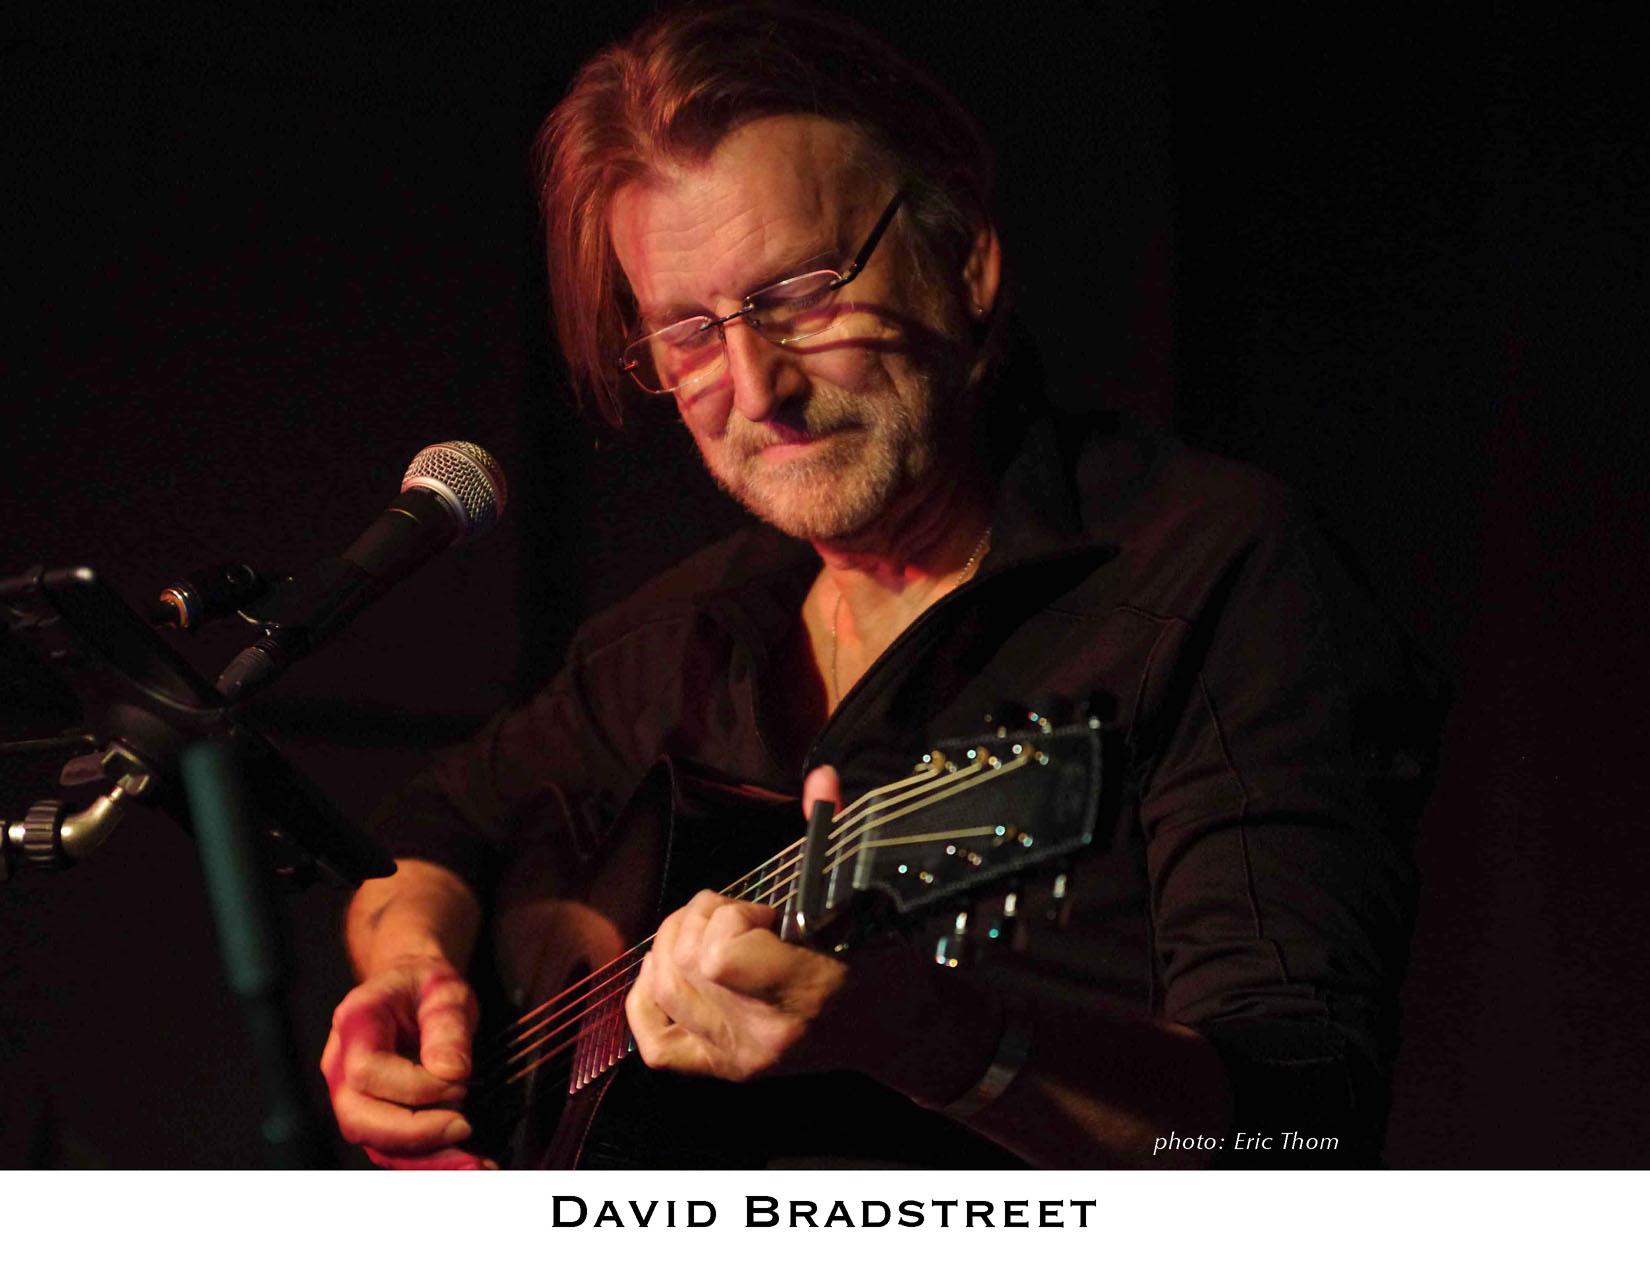 David Bradstreet